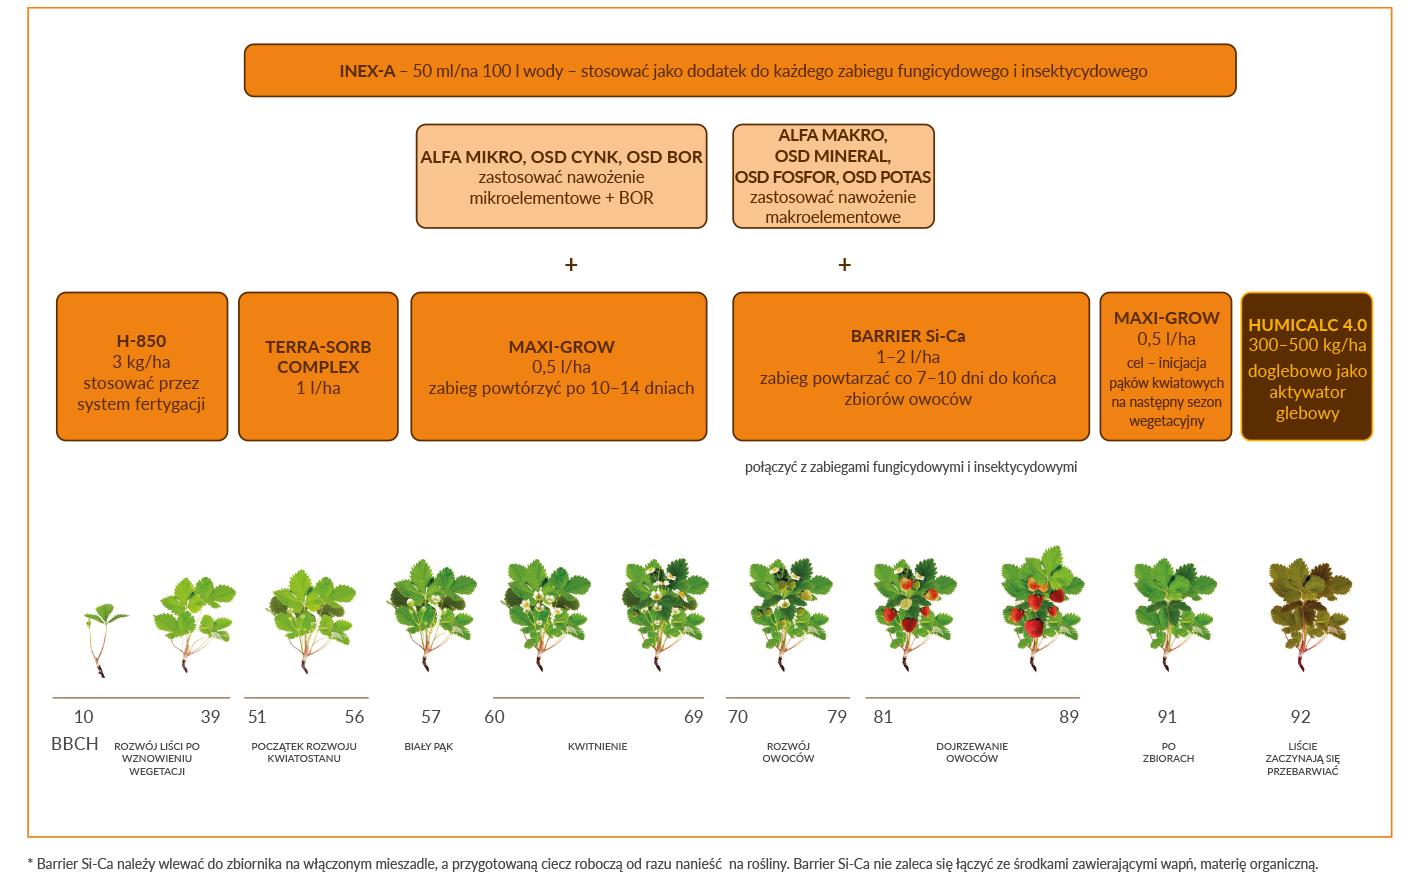 Truskawka _ Technologia DSG i stymulacja truskawki gruntowej